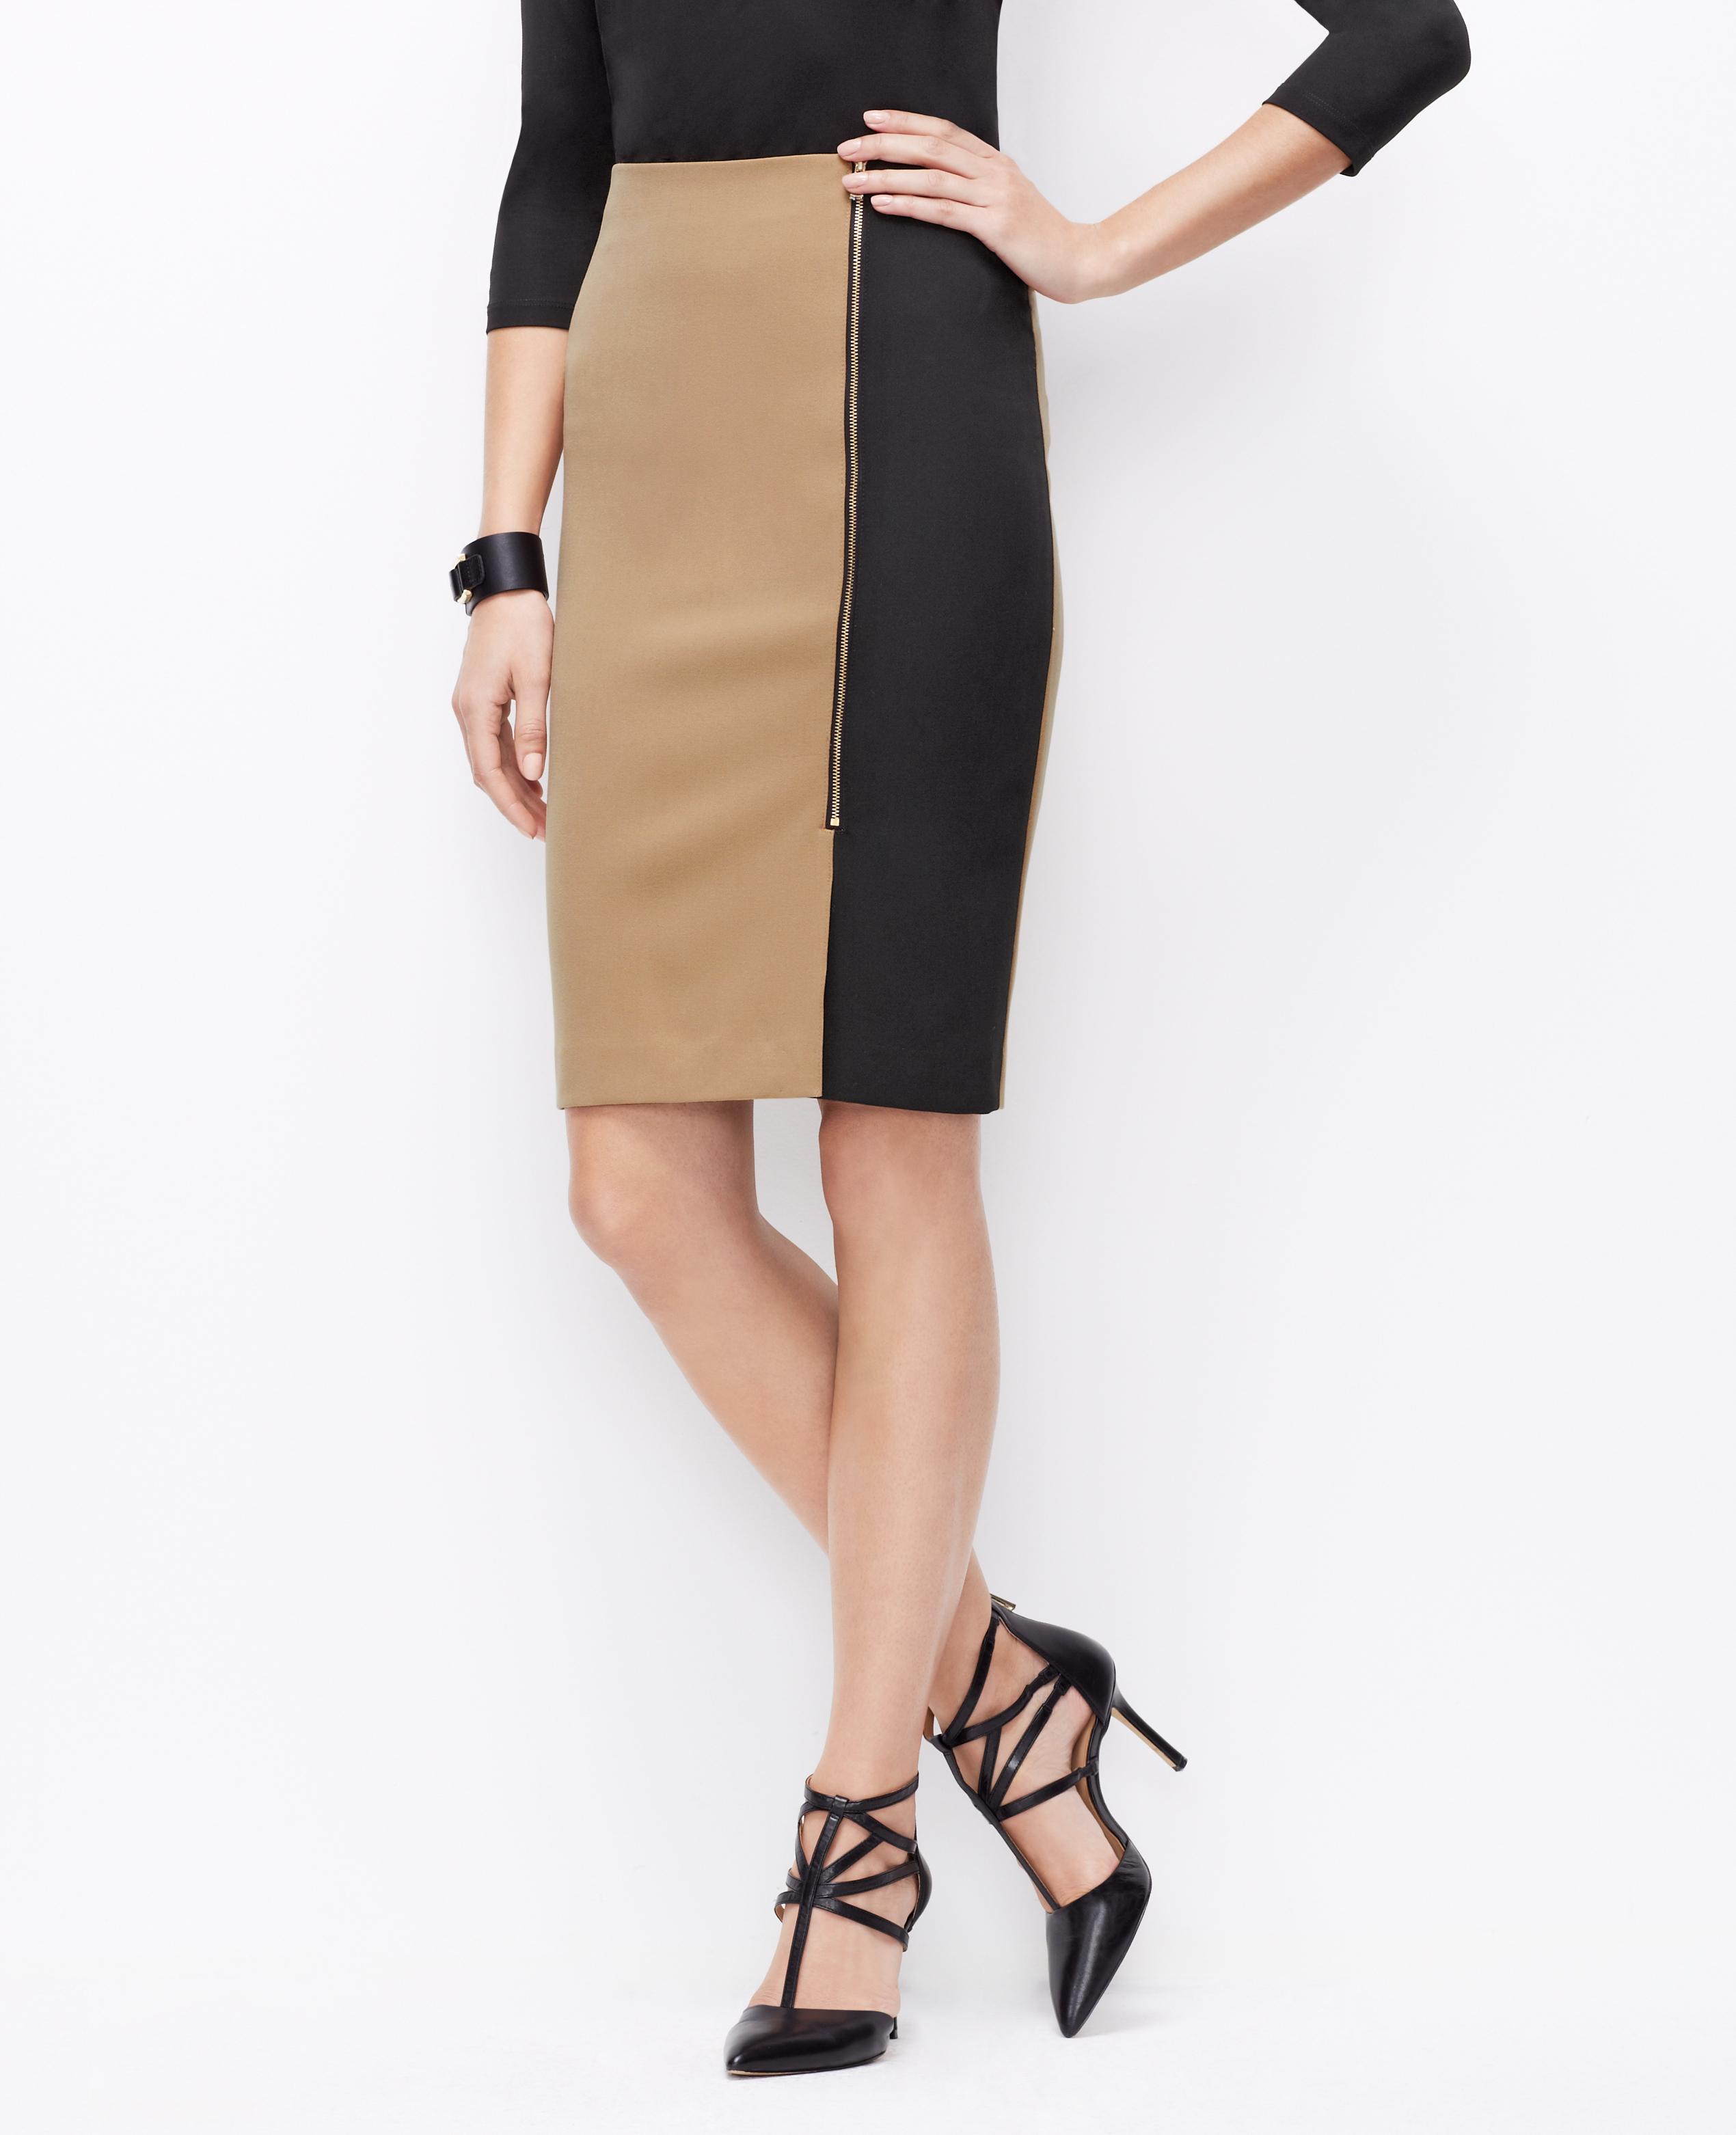 camel colored pencil skirt dress ala